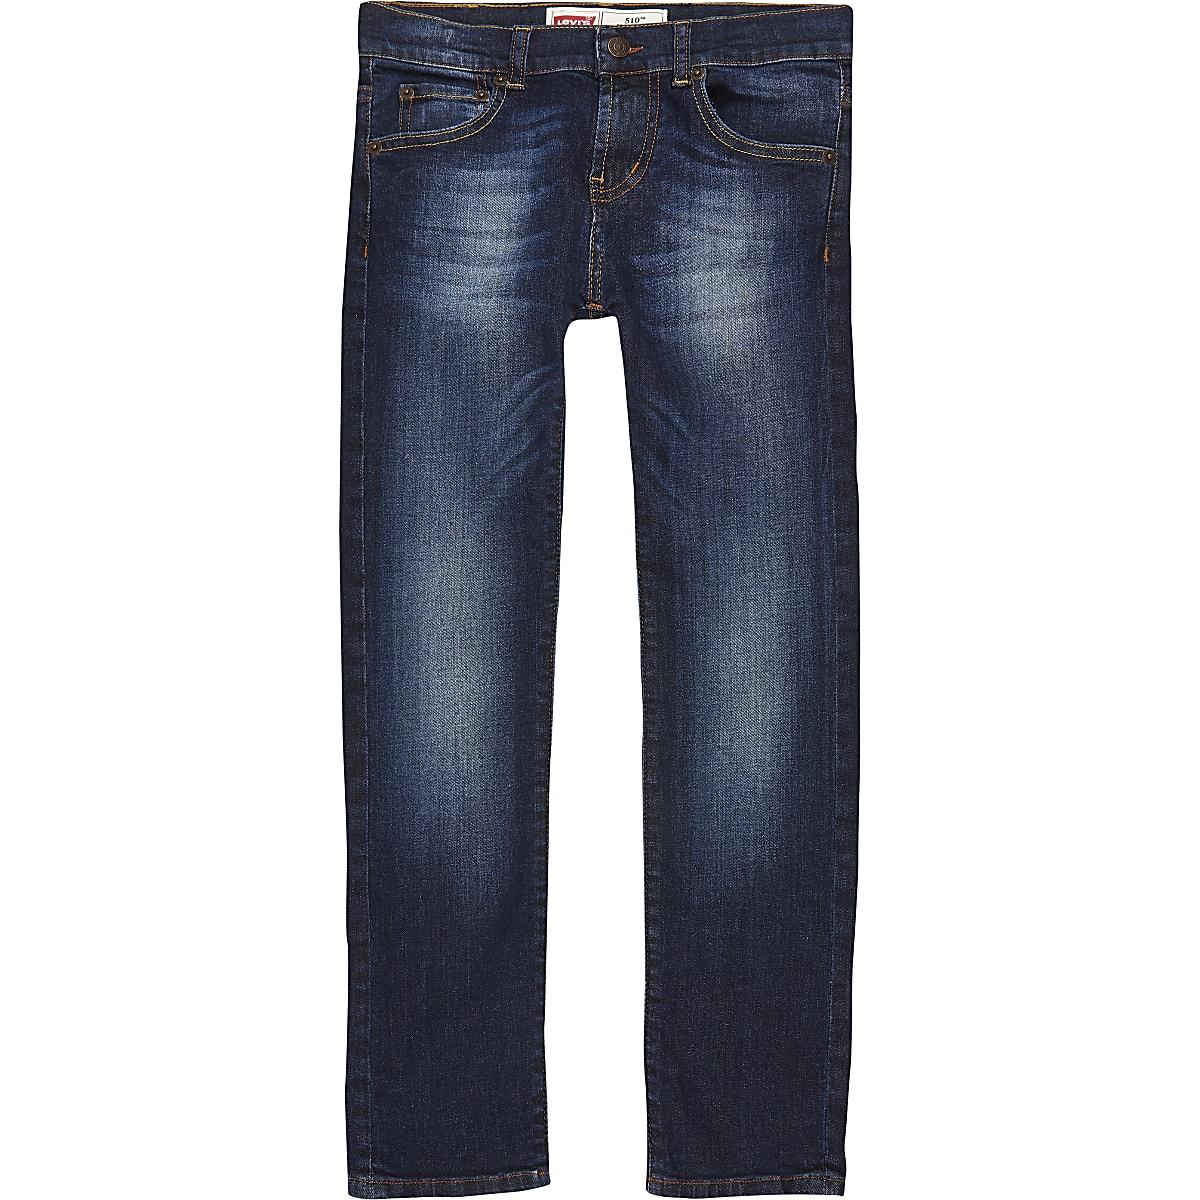 Levi's - Donkerblauwe skinny-fit jeans voor jongens